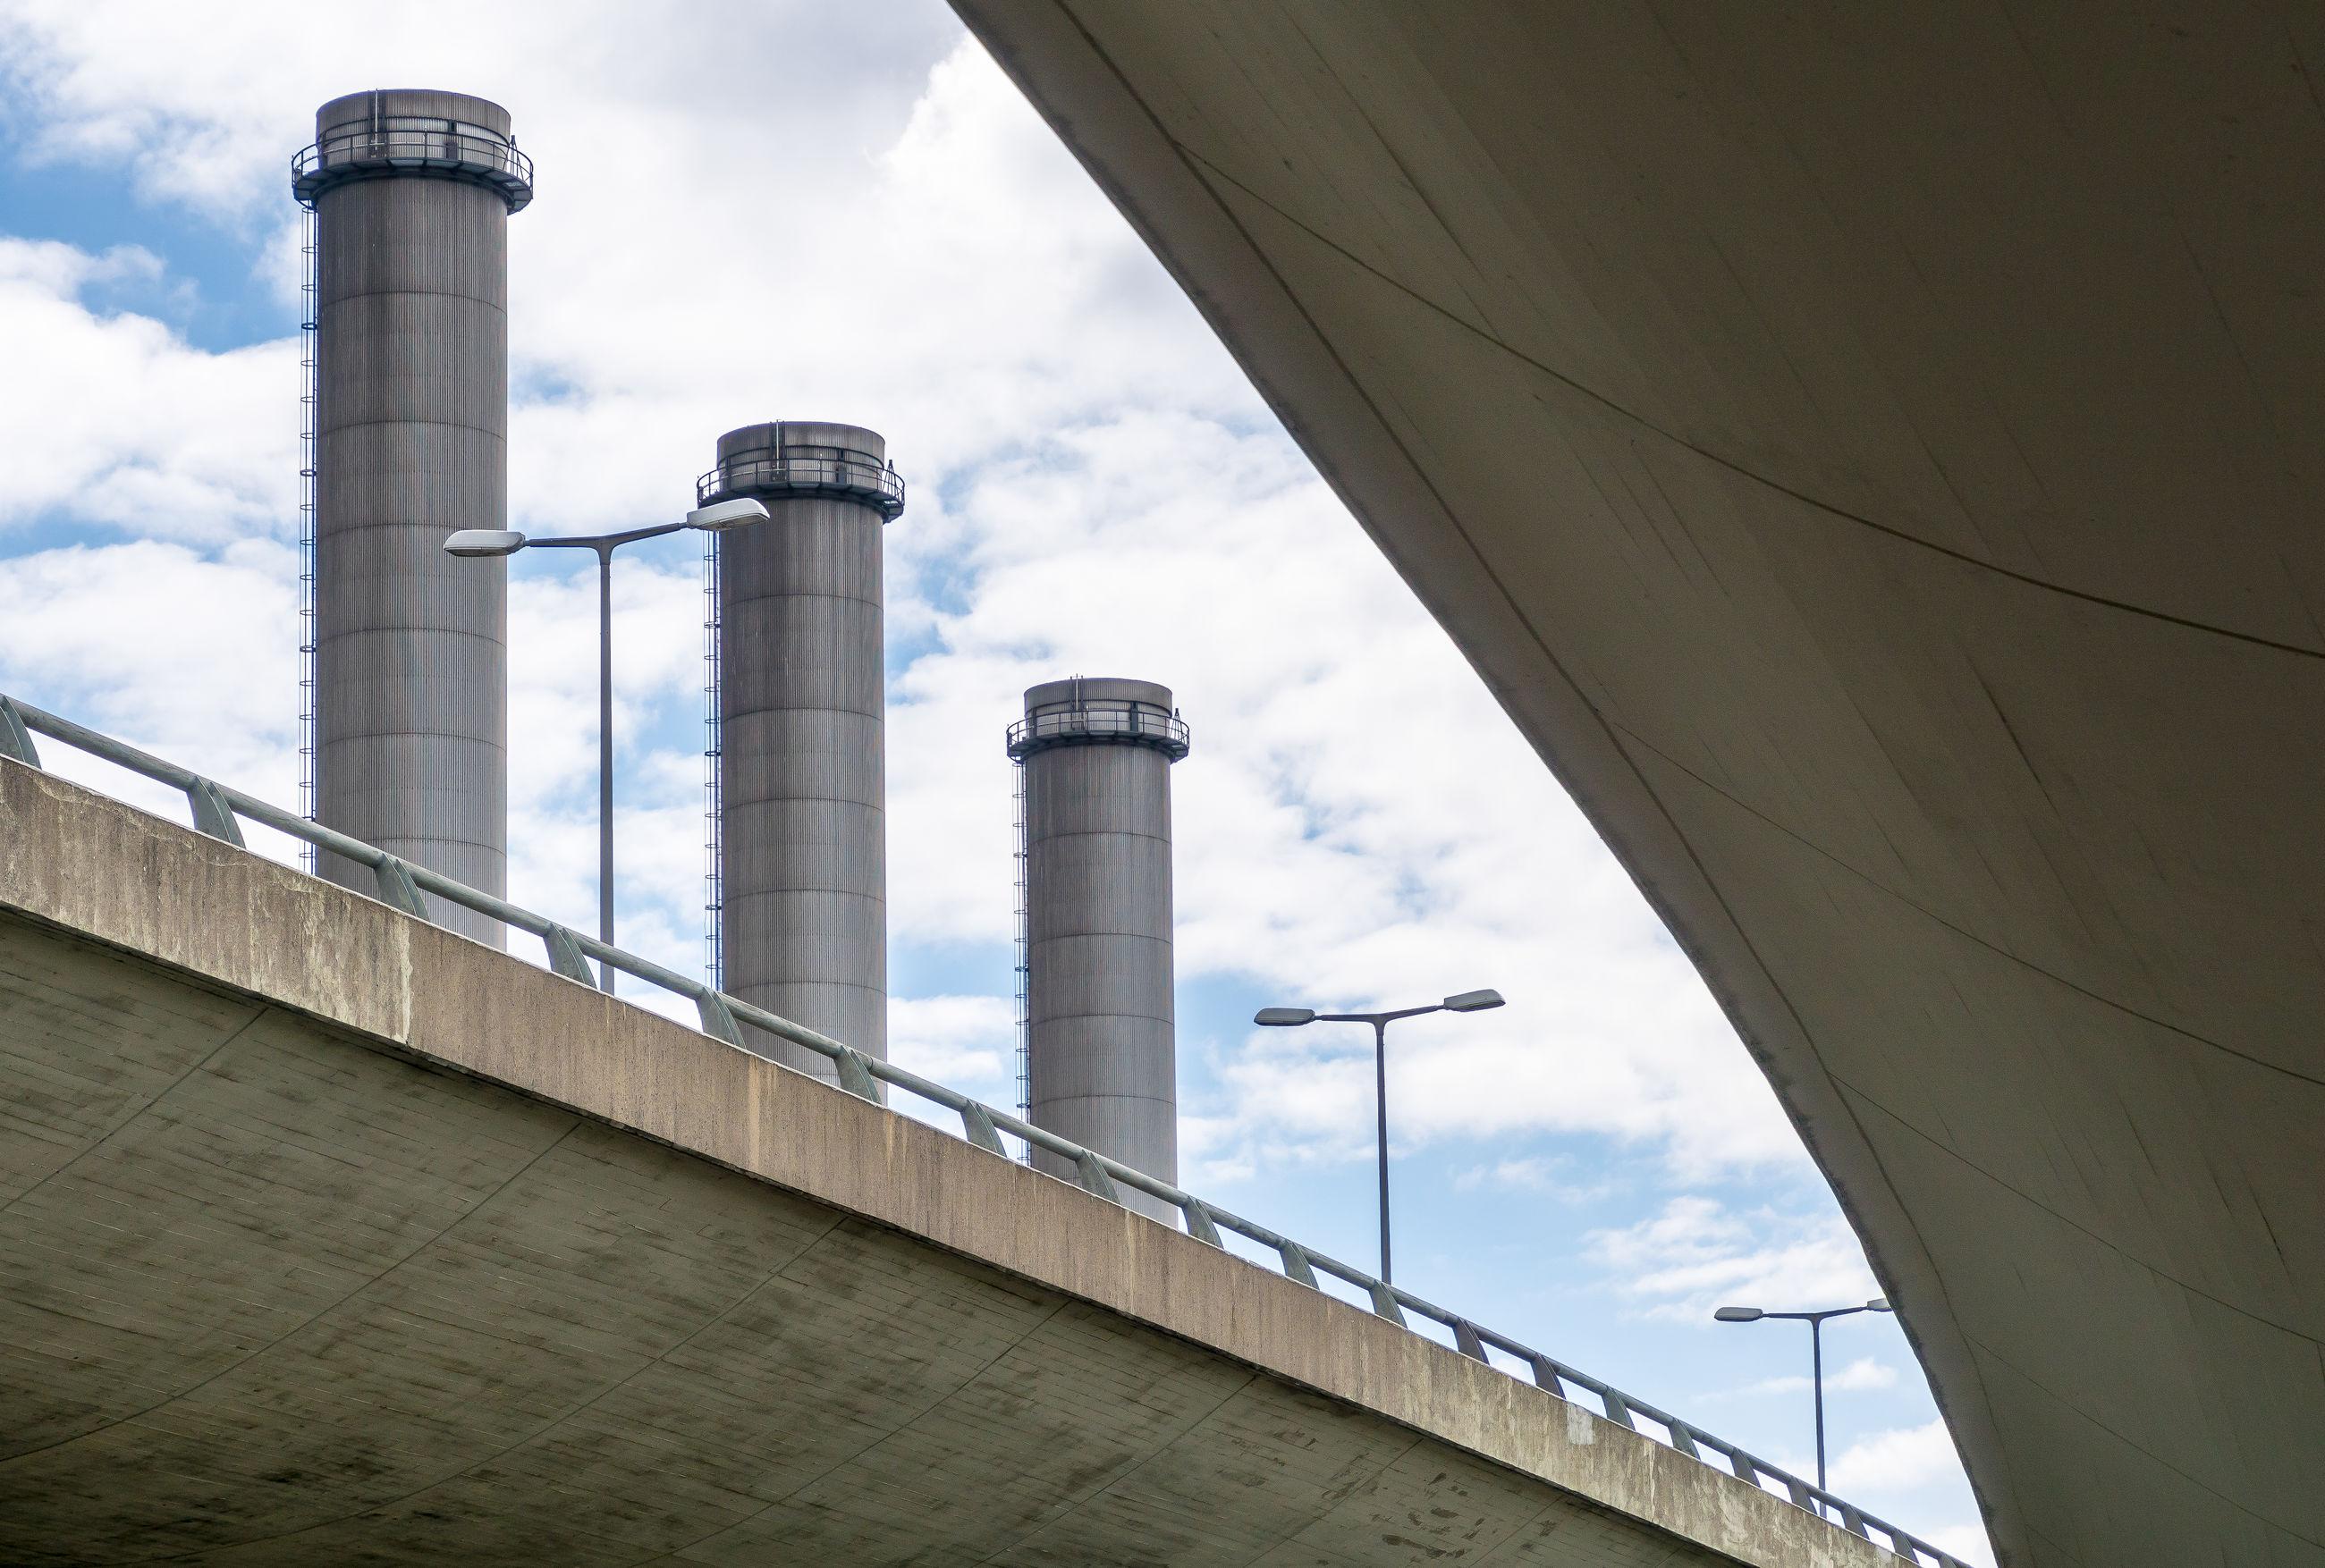 Low angle view of bridge against smoke stacks